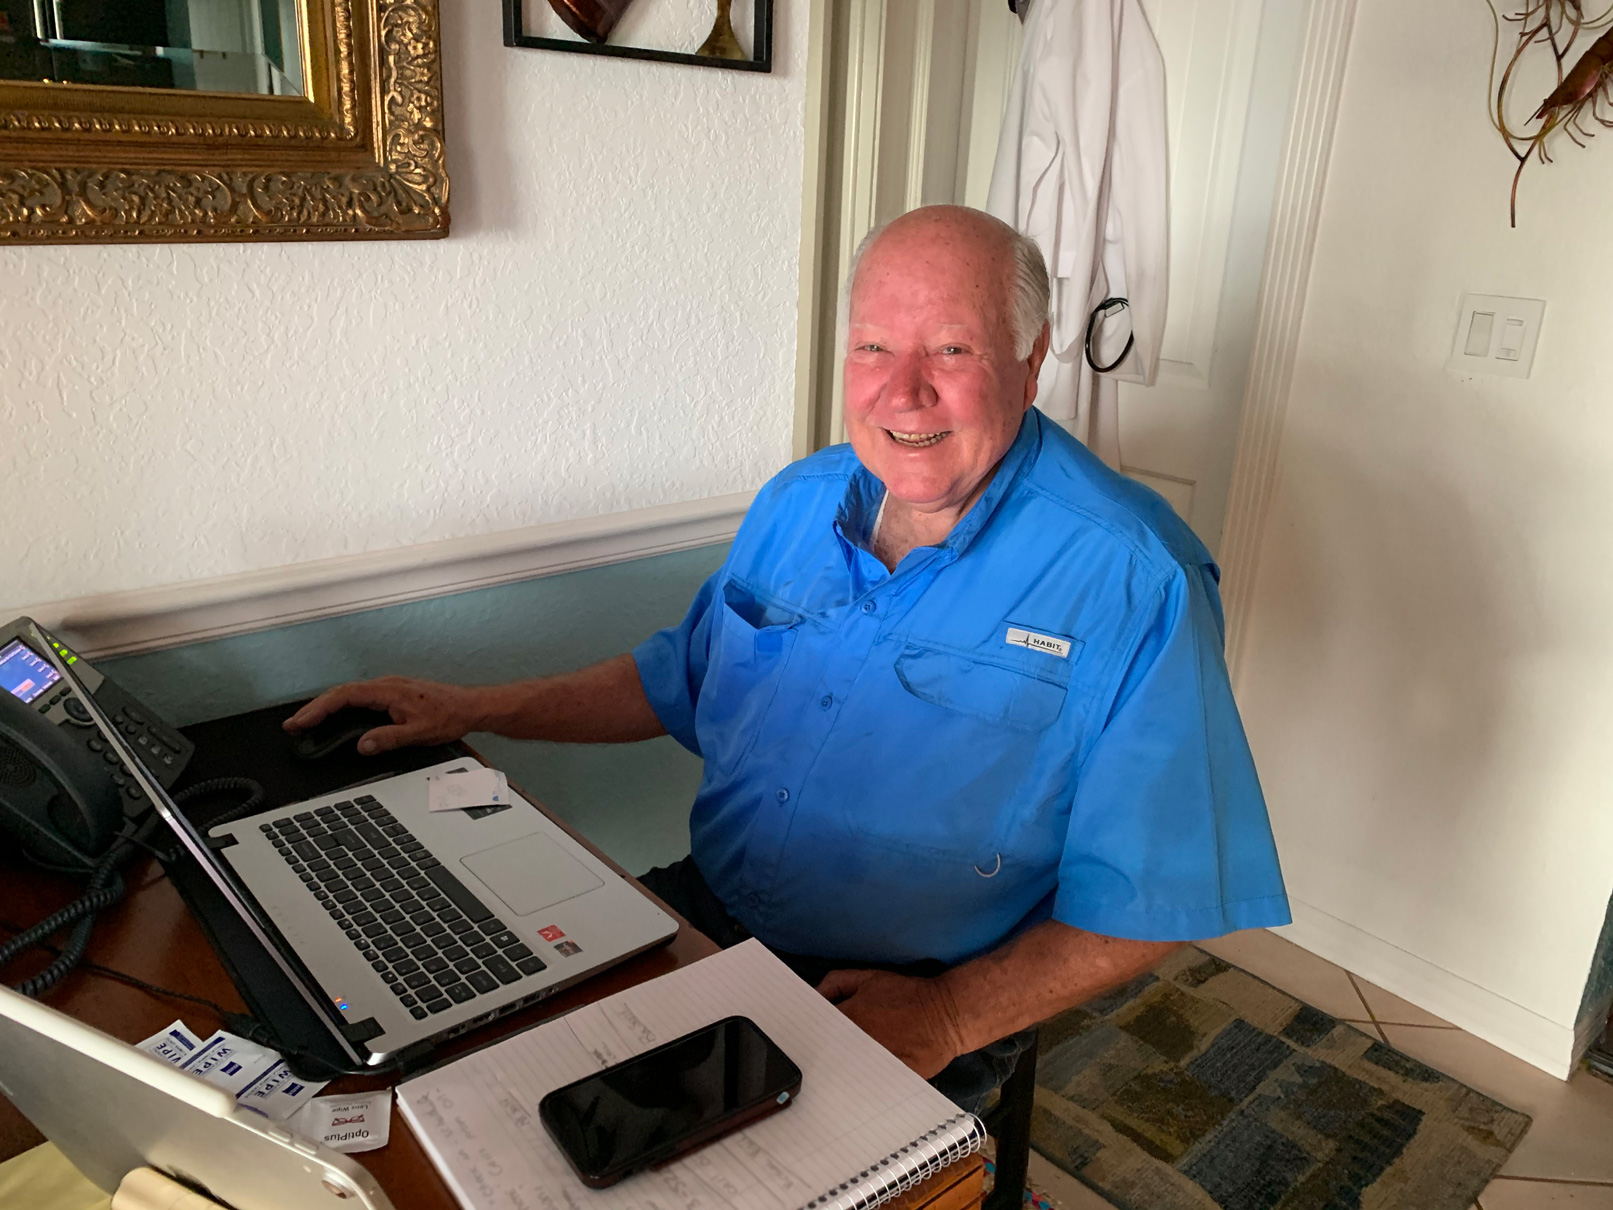 Telemedicine Services - Online Doctor Visit - Dr. Daniel W. McGrane - dr online - Telemedicine near me